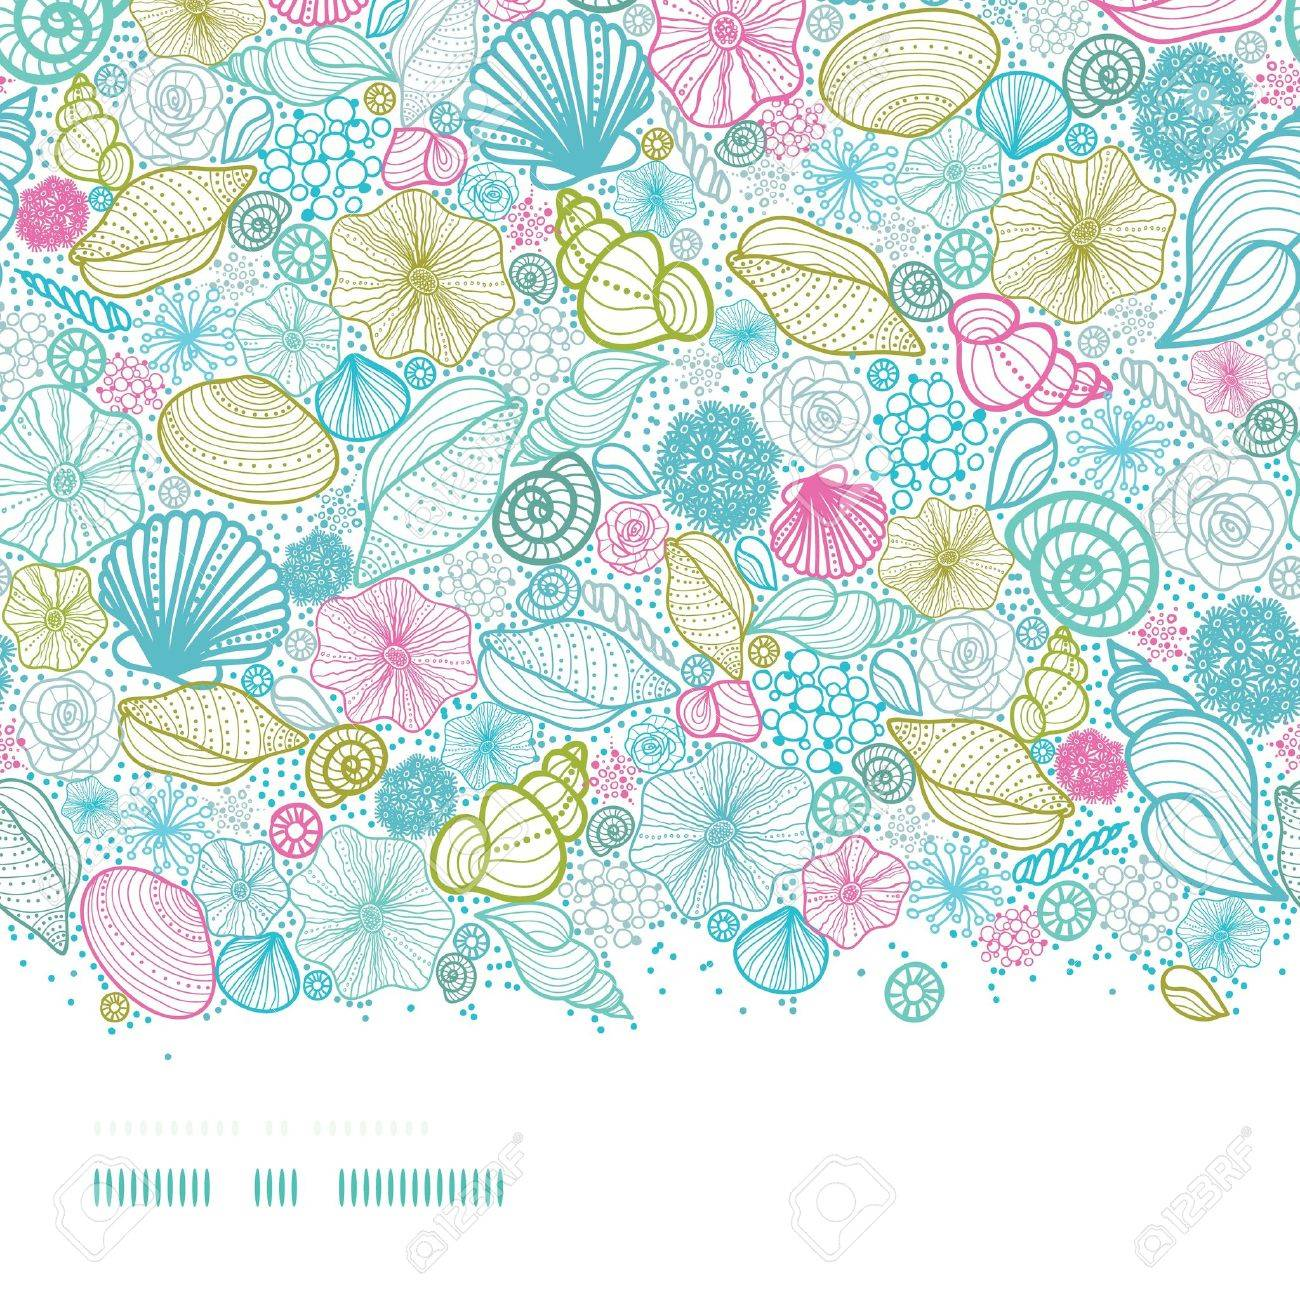 Seashells line art horizontal seamless pattern background - 18410328